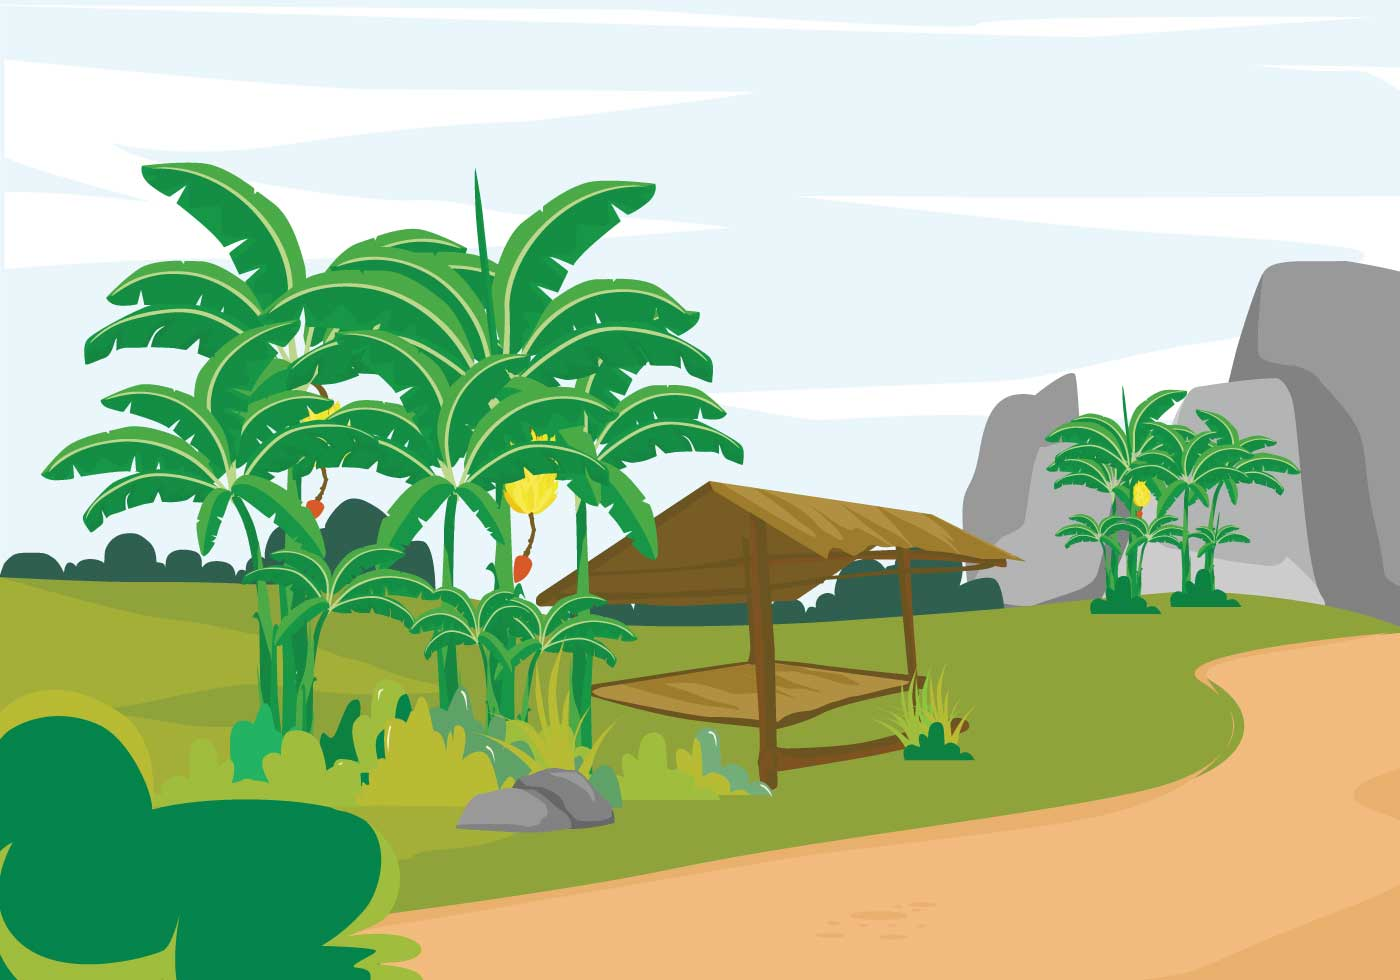 Landscape Illustration Vector Free: Free Banana Tree Landscape Illustration